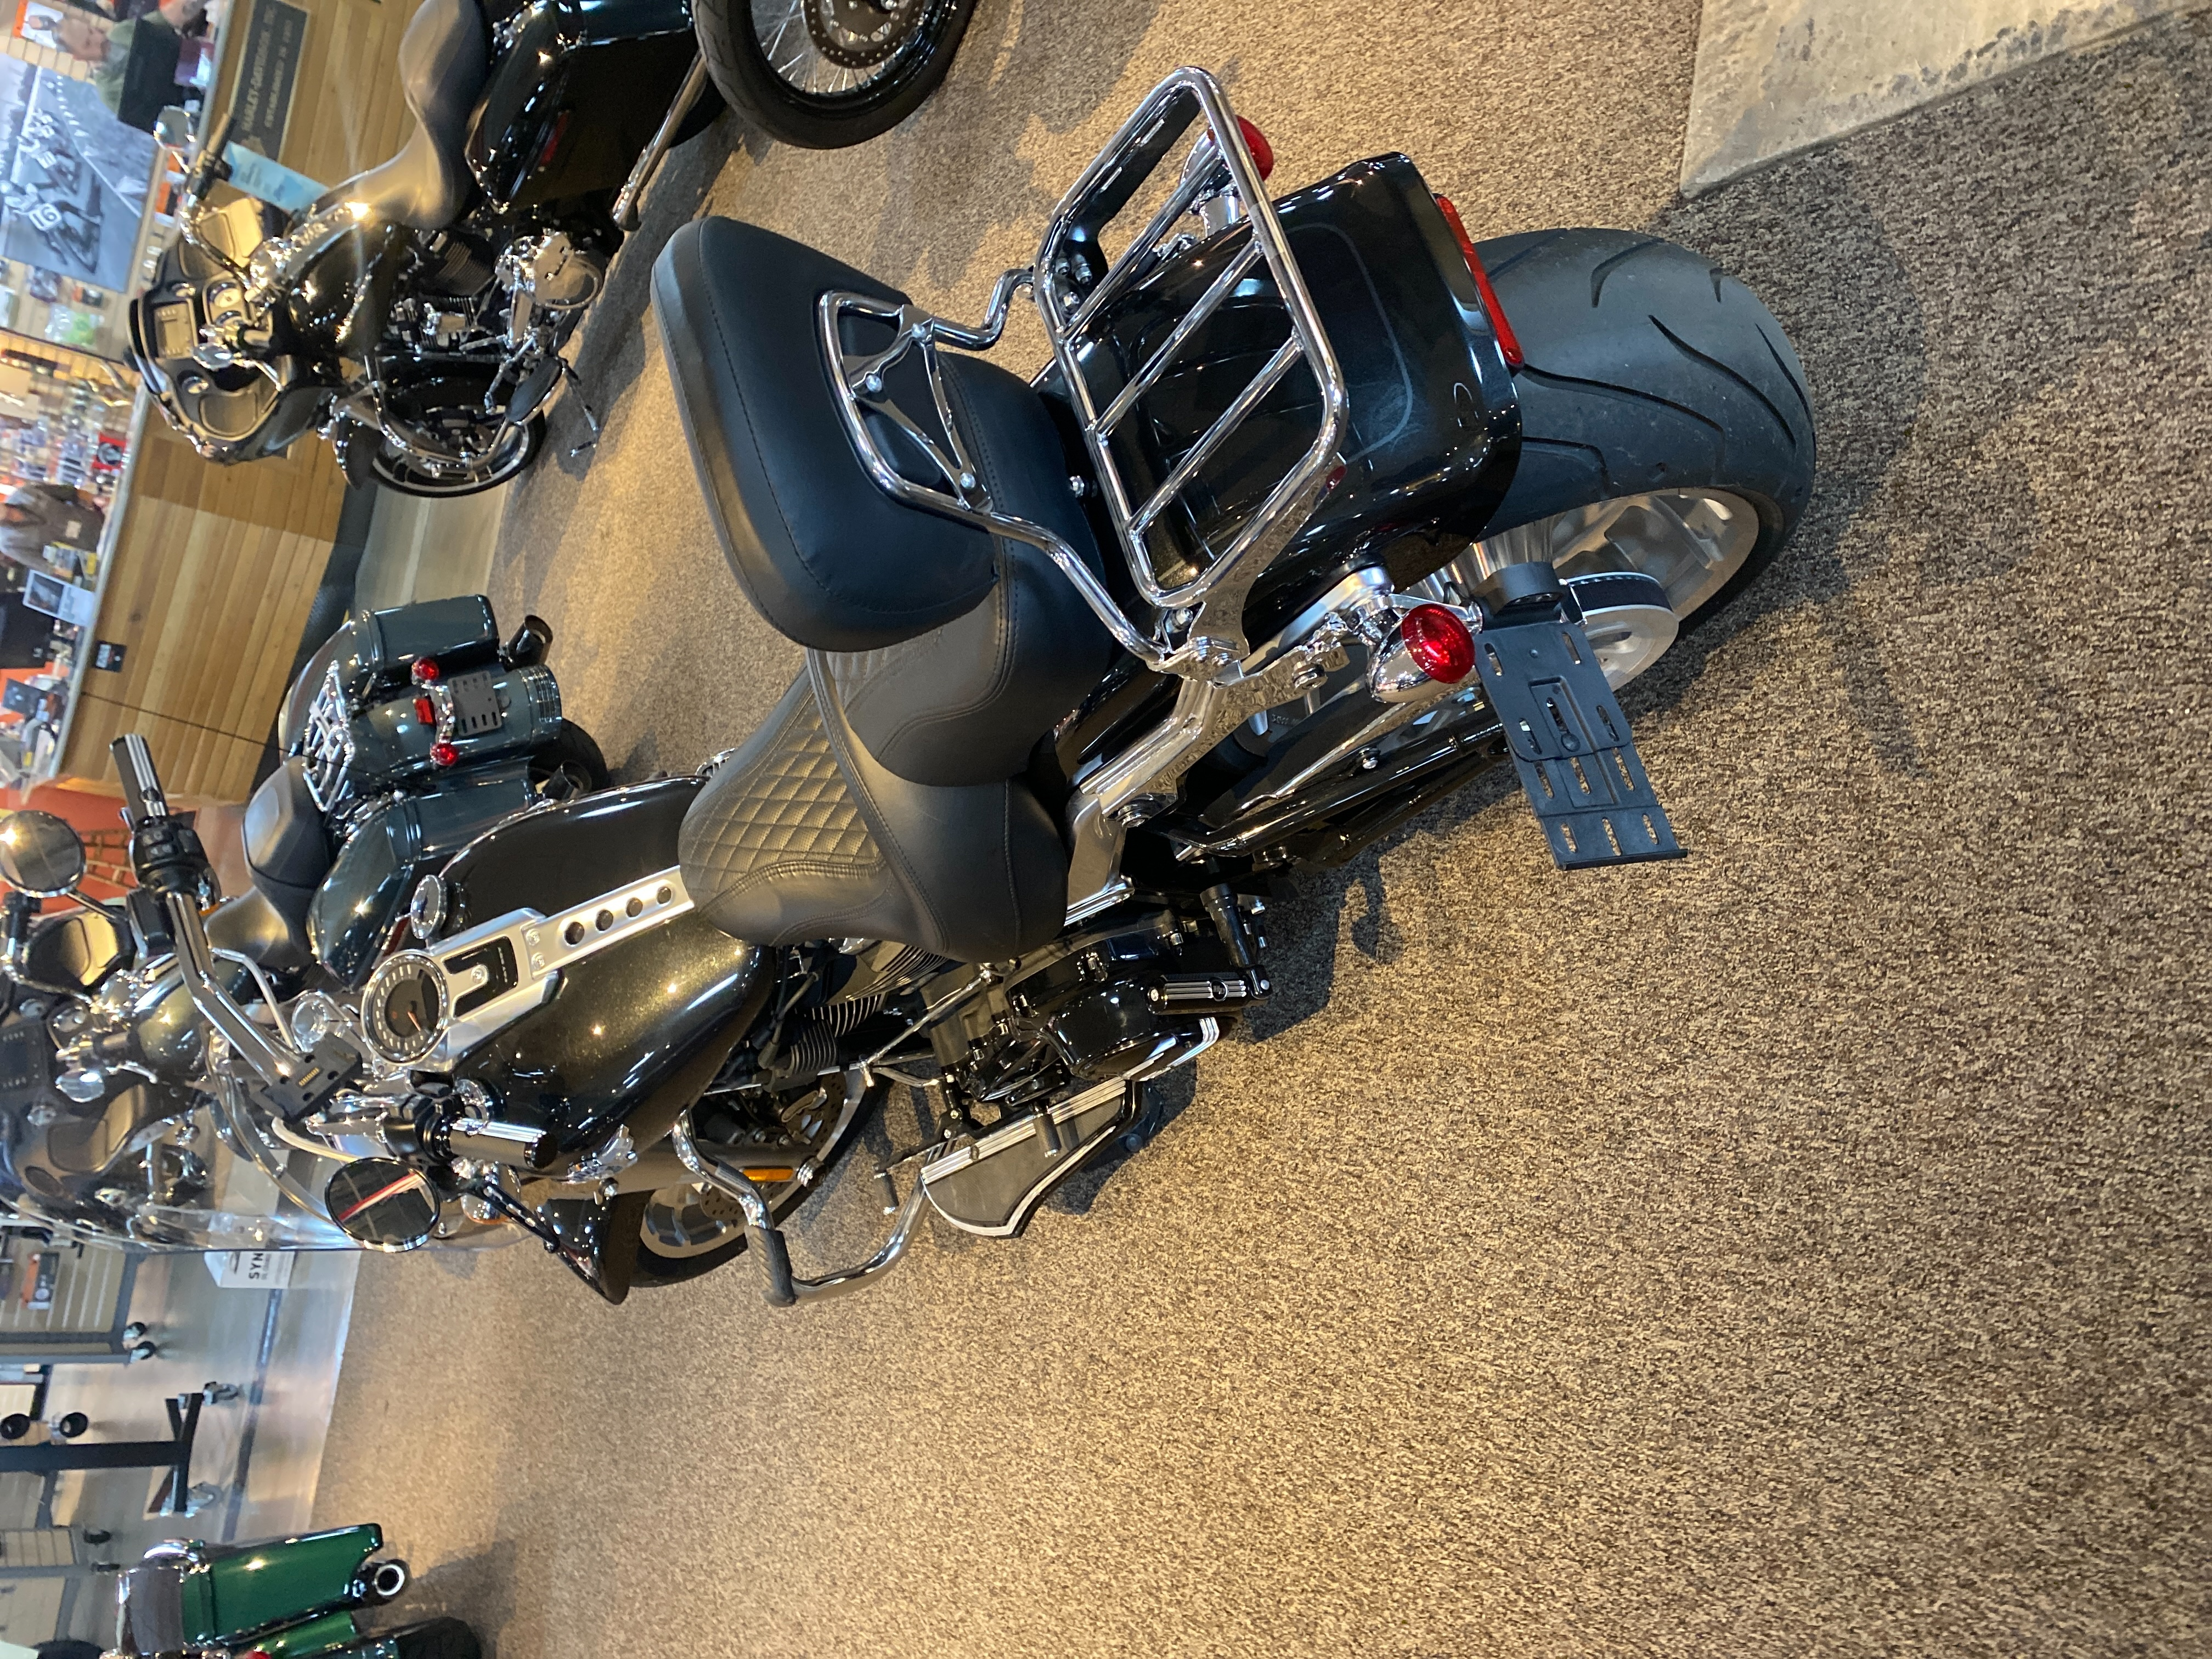 2018 Harley-Davidson Softail Fat Boy 114 at Outpost Harley-Davidson